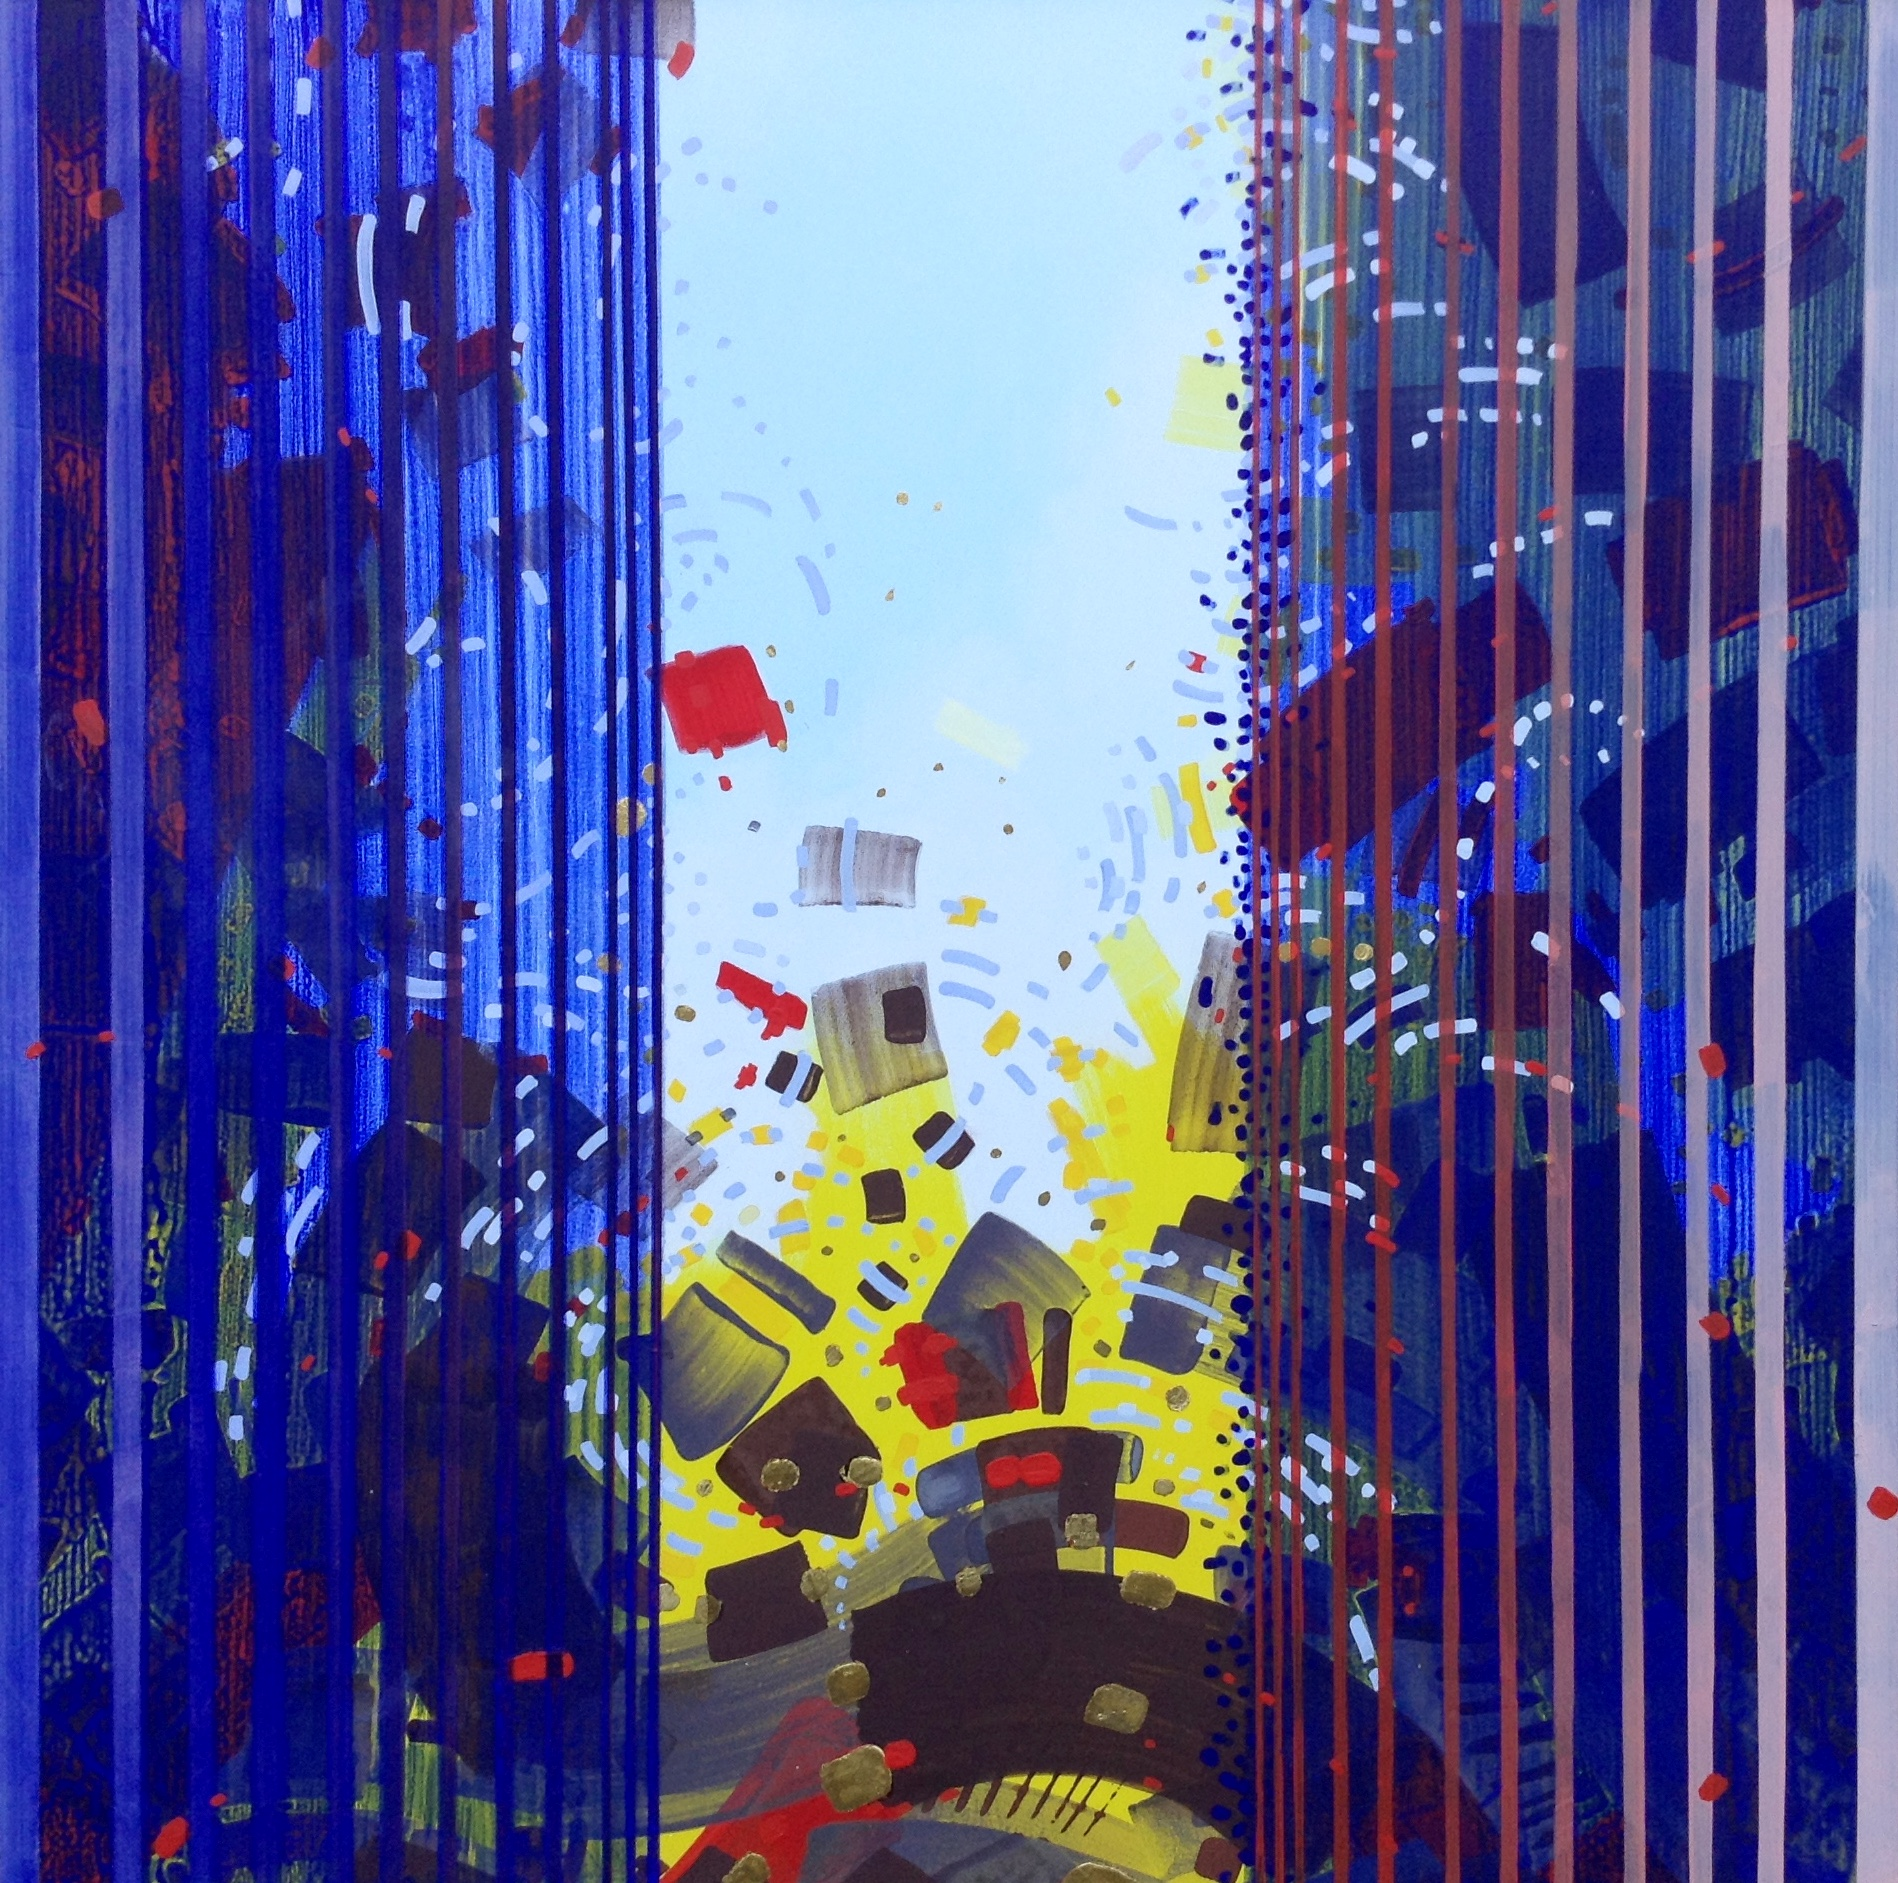 Jurgen Tarrasch,Between, mixed media-pigments, 23K gold leaf on canvas, 40x40 inches, 2014-2015.JPG